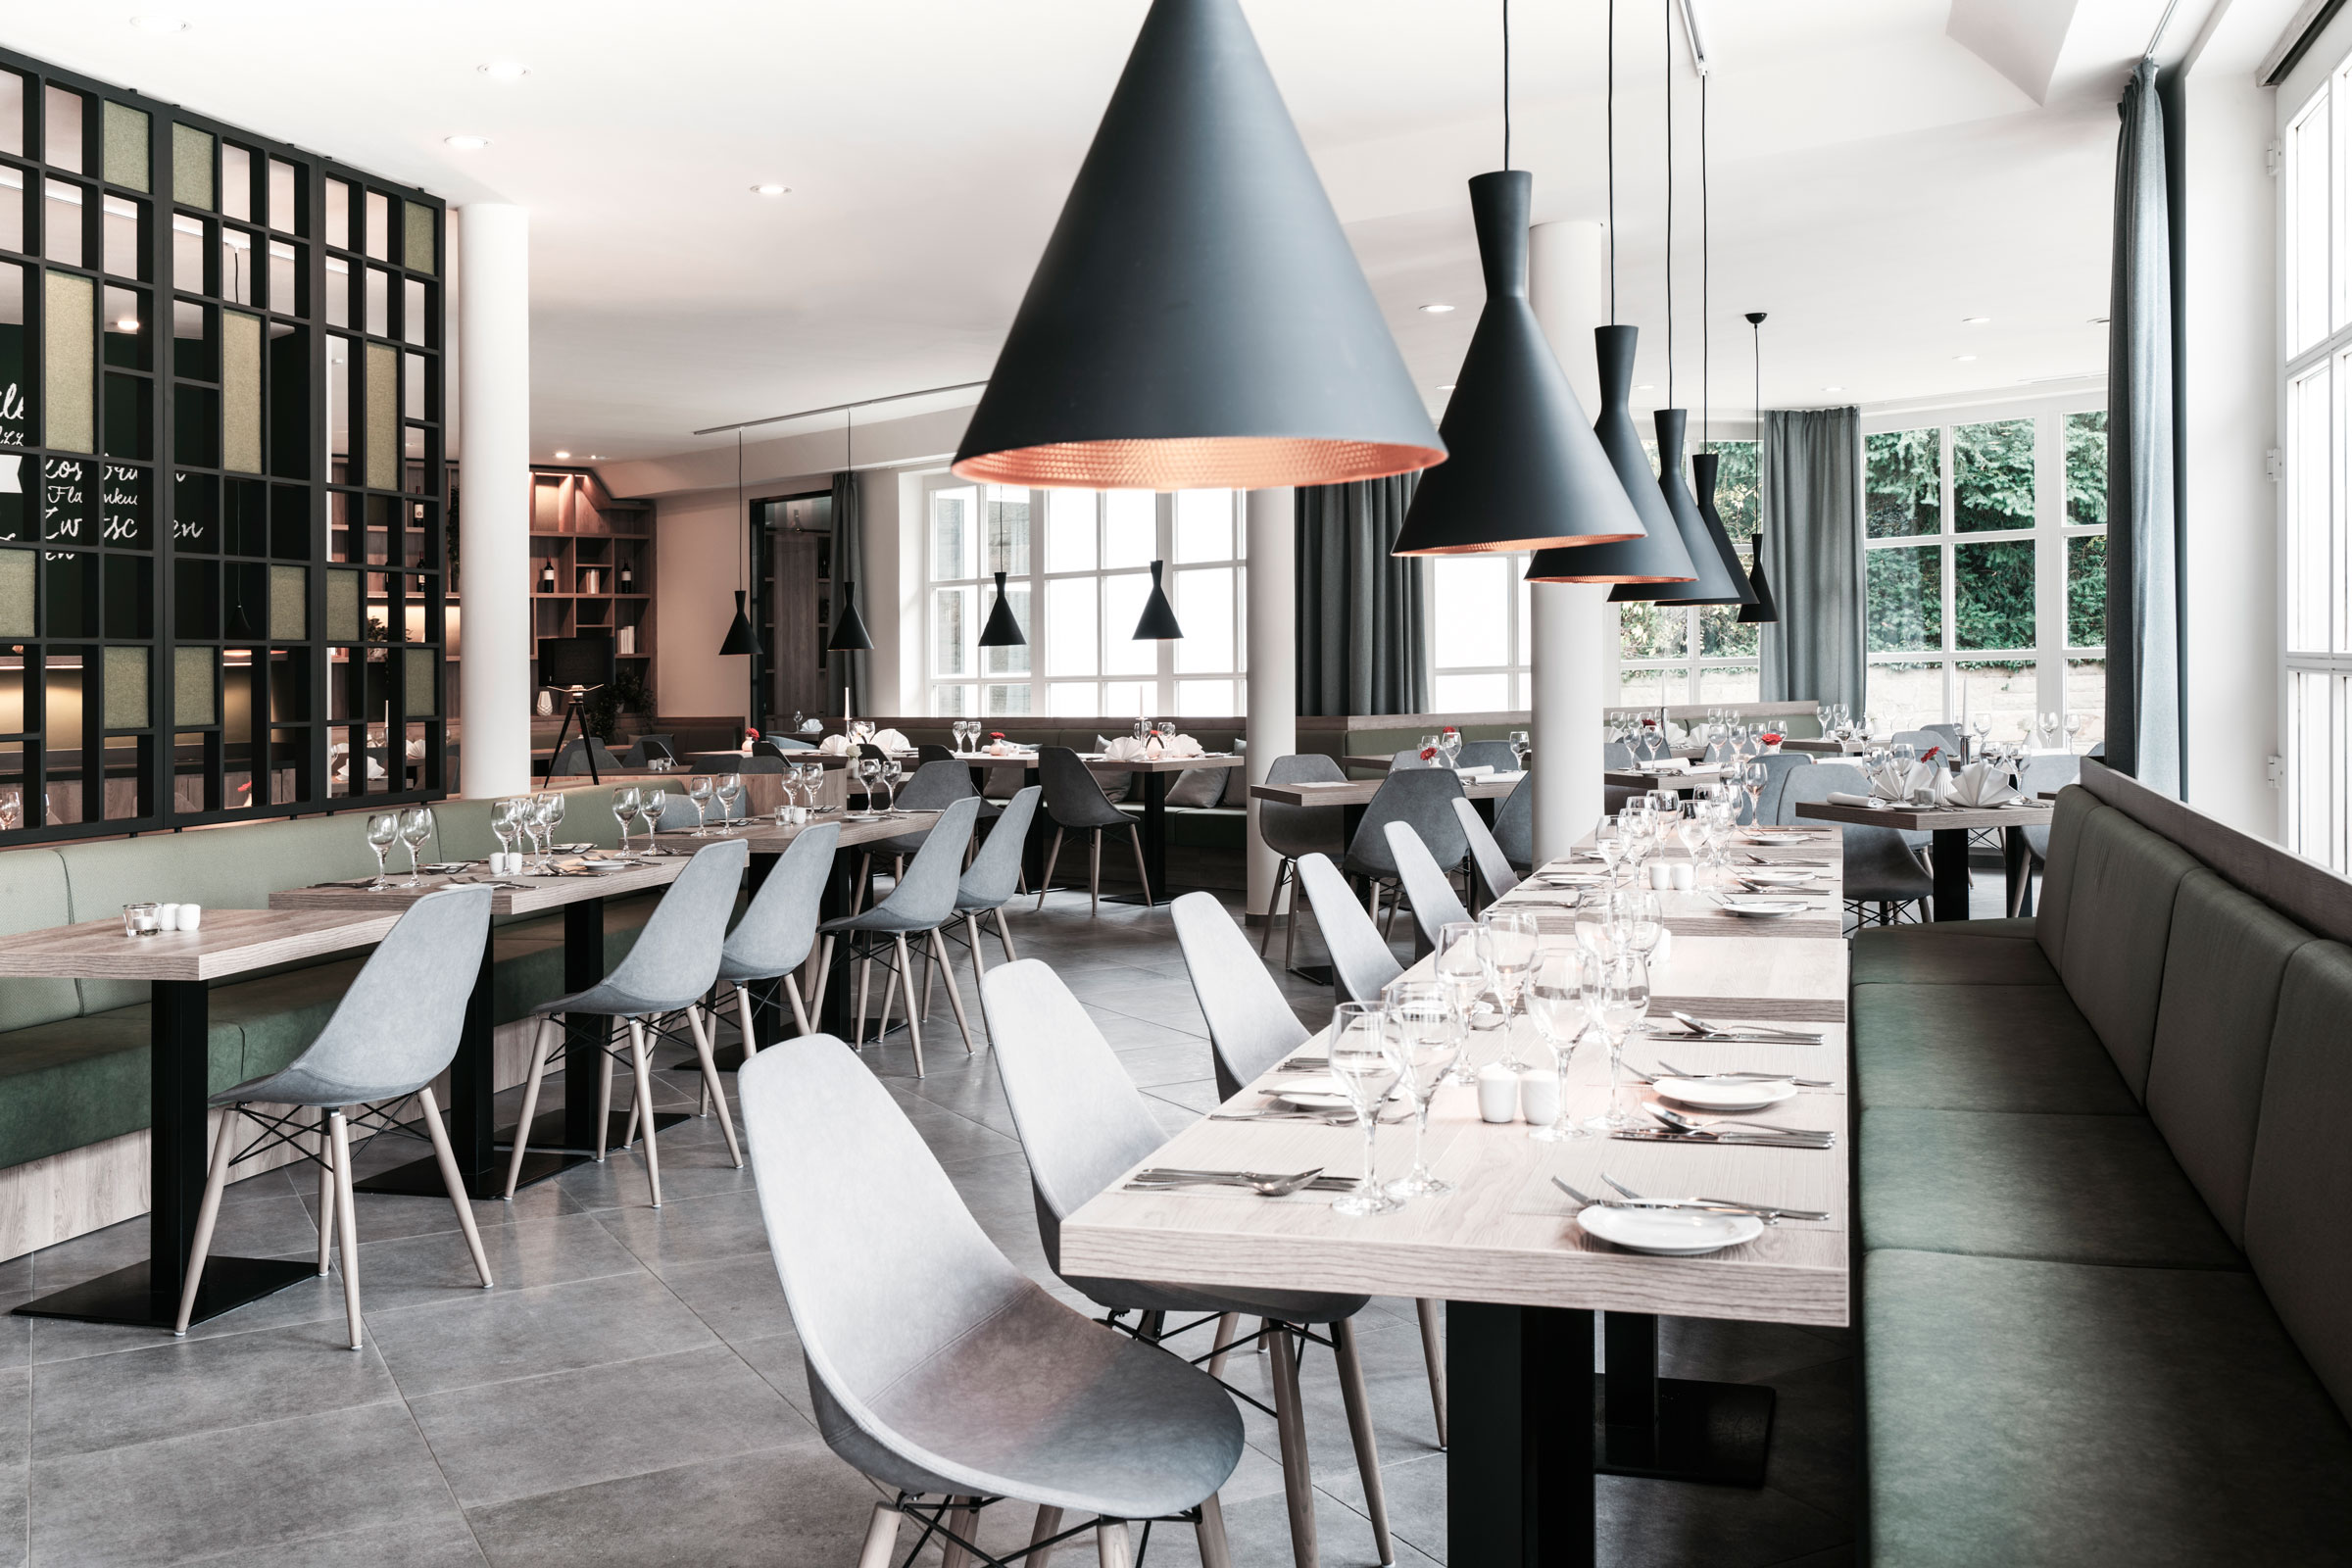 Awesome Hotelzimmer Design Mit Indirekter Beleuchtung Bilder Images - House Design Ideas ...